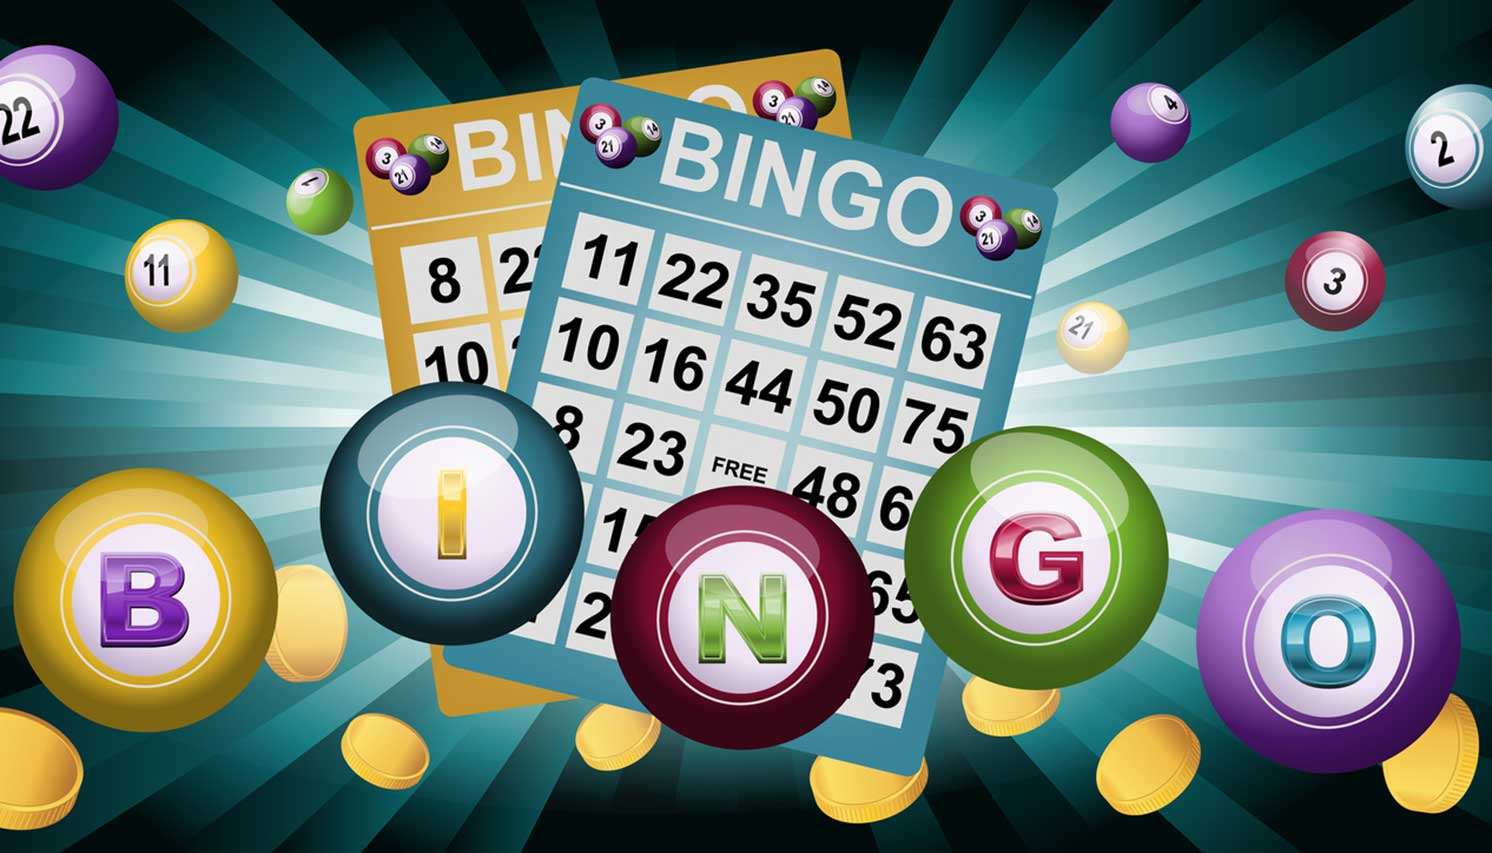 The most effective method to Increase Your Chances of Winning Online Bingo  Games - 888 Online Gambling